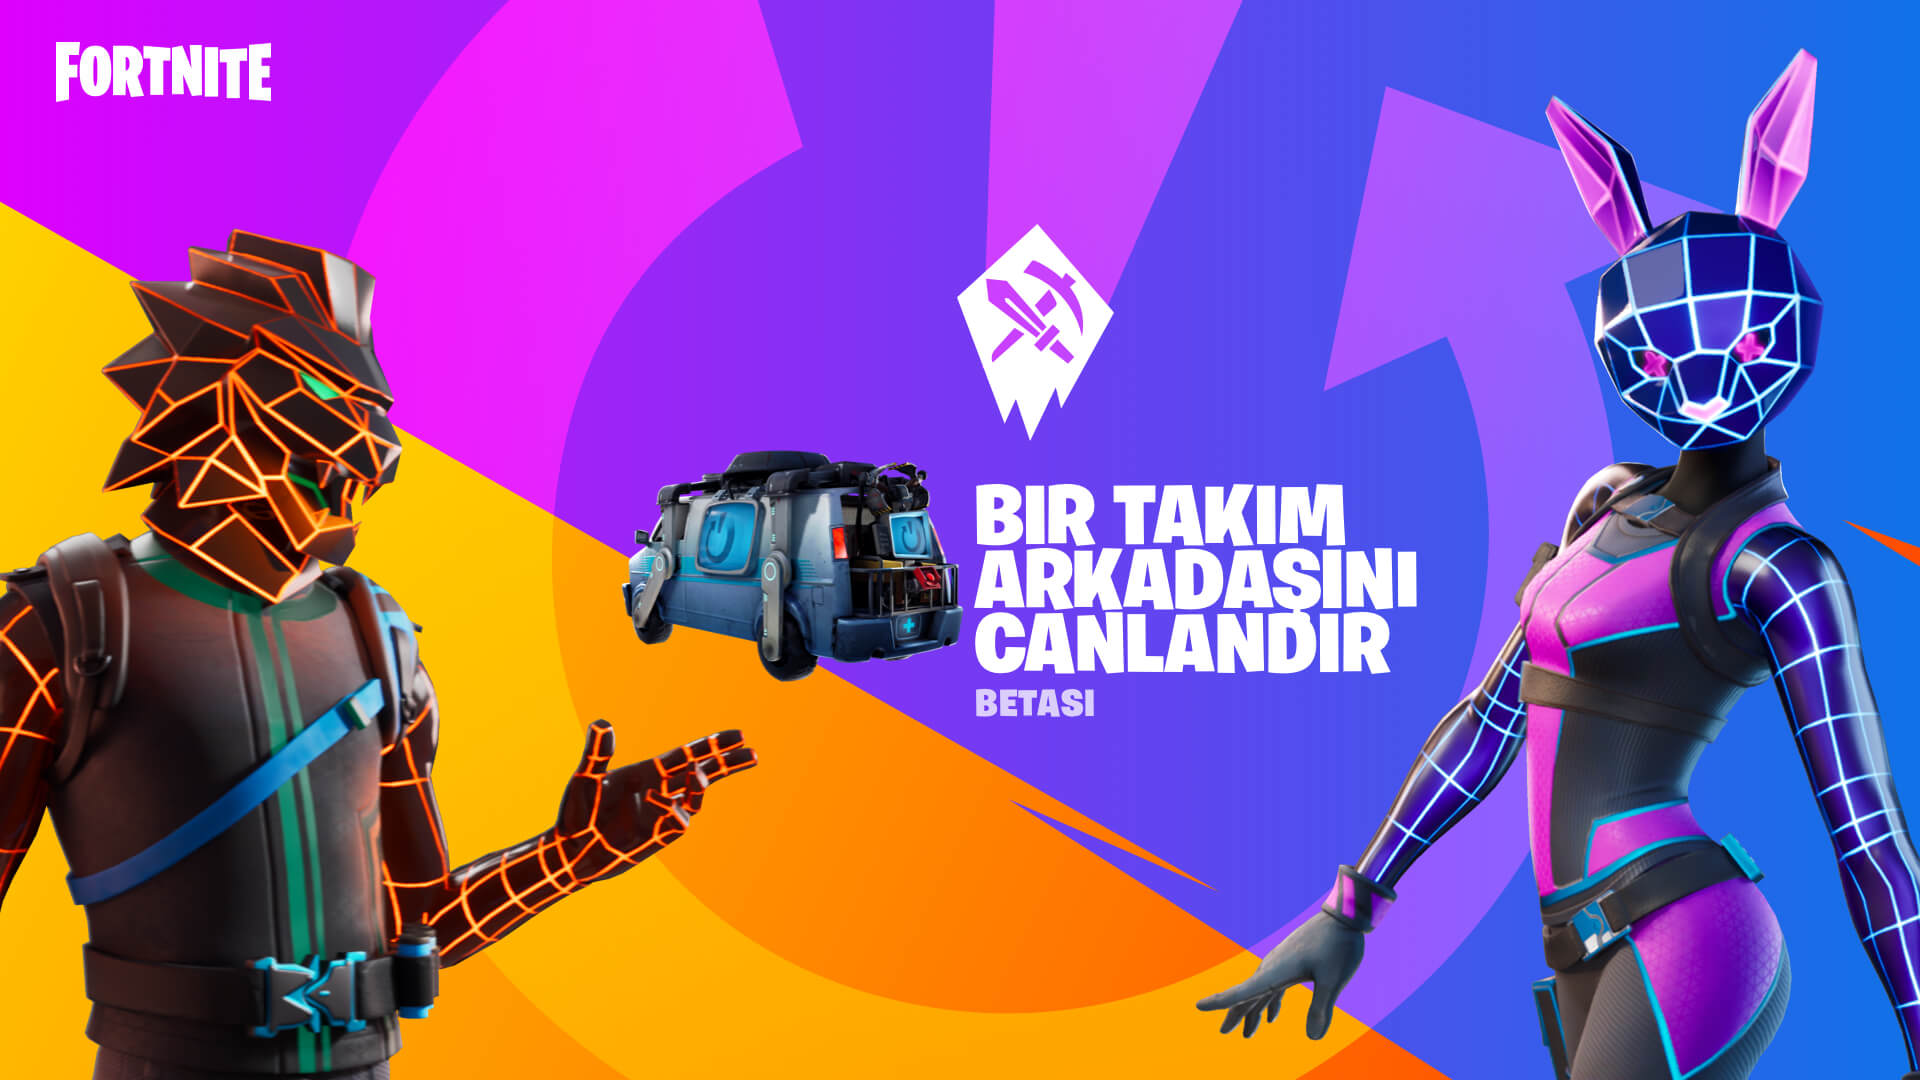 1920 1080 Turkish